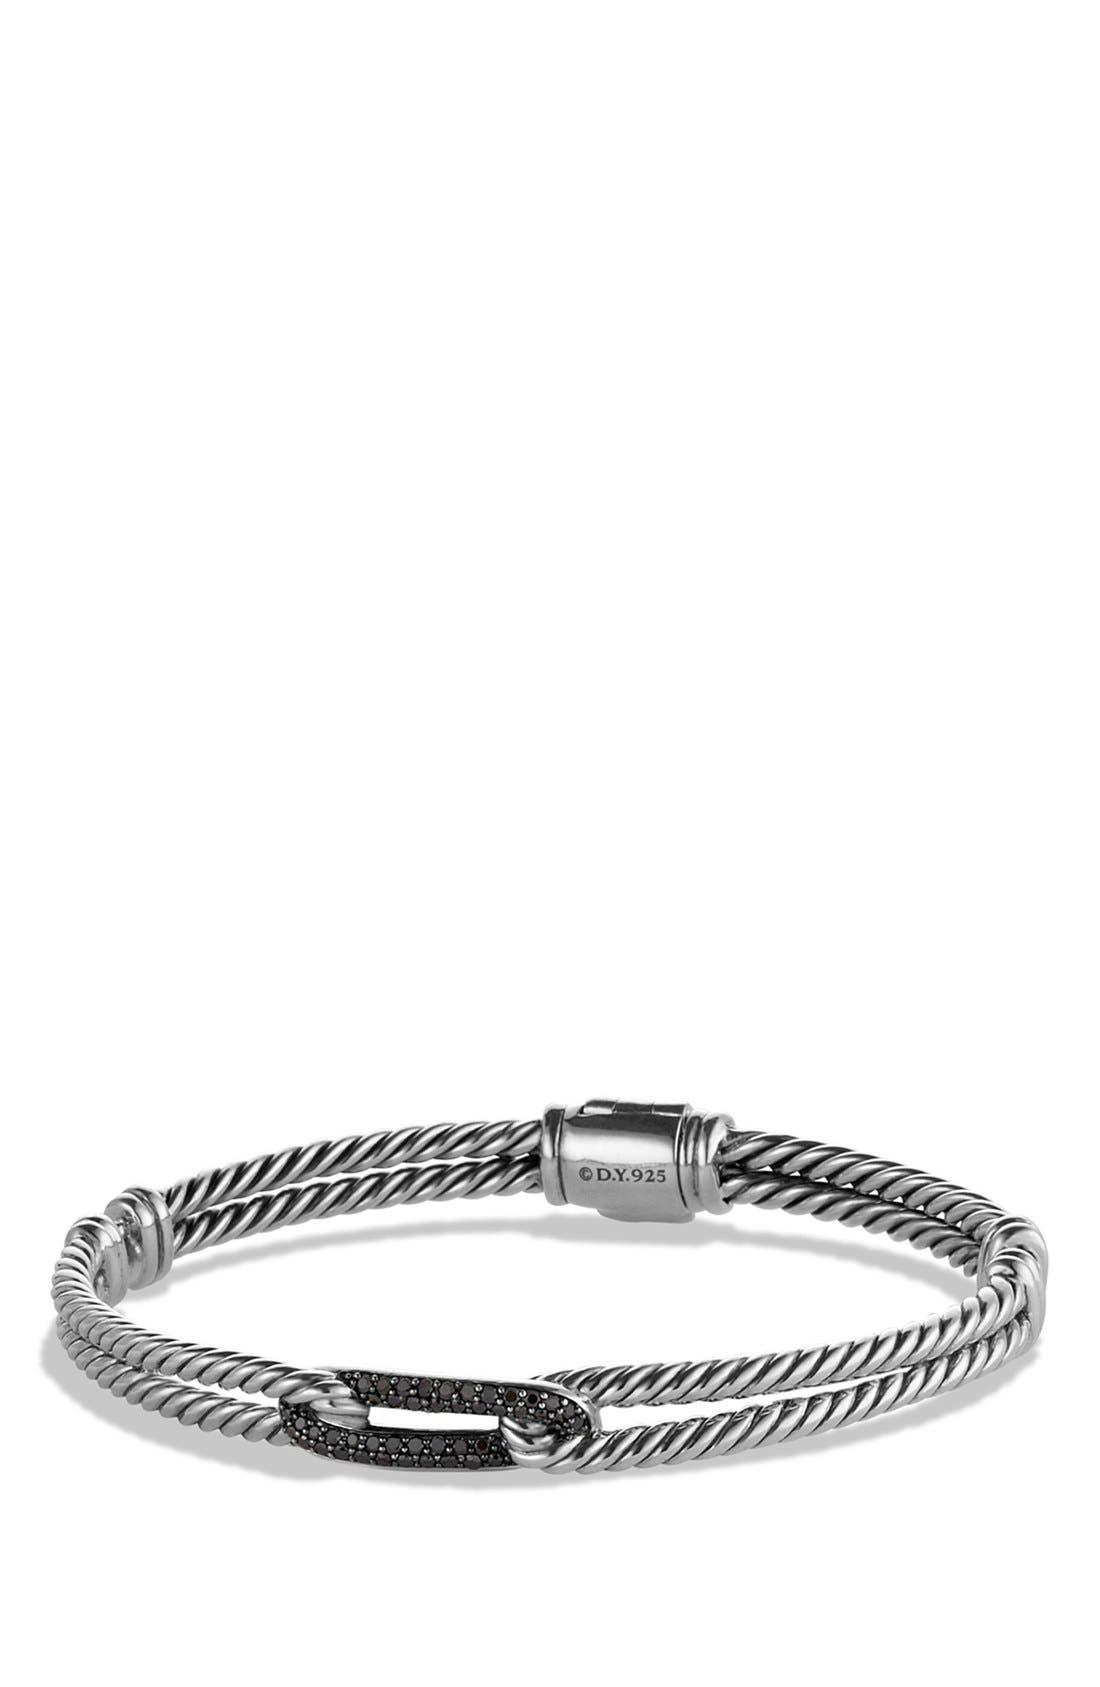 DAVID YURMAN Petite Pavé Labyrinth Mini Single Loop Bracelet with Diamonds in Gold